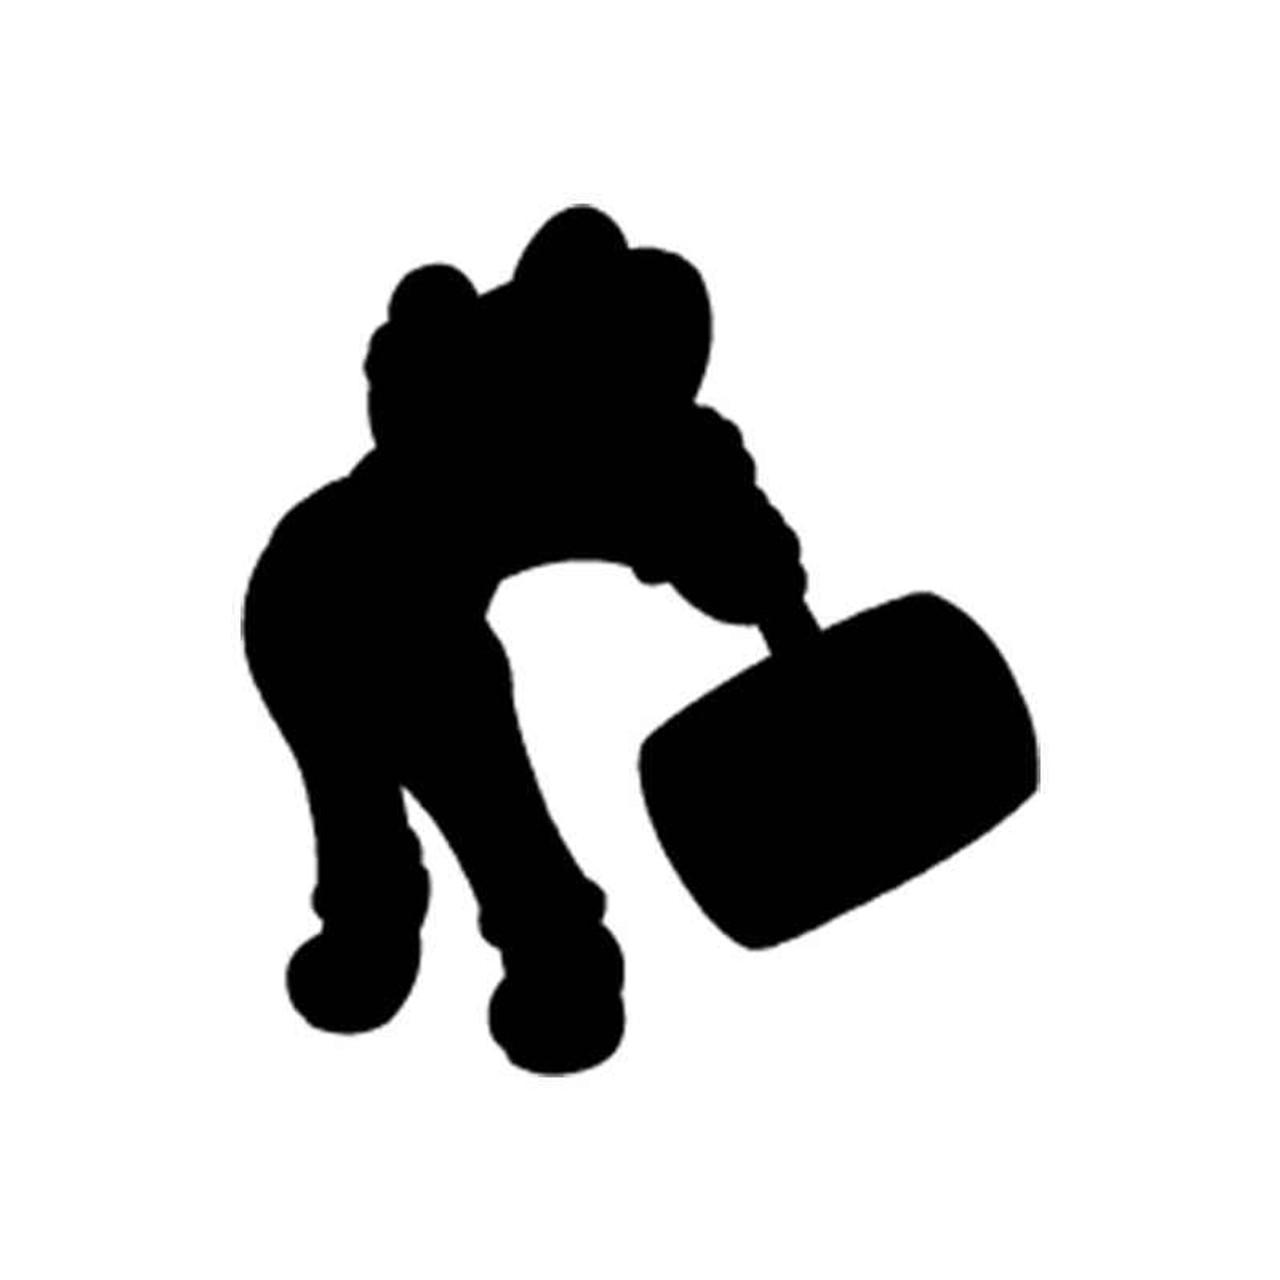 Mario Bros Mario Hammer Silhouette Vinyl Sticker